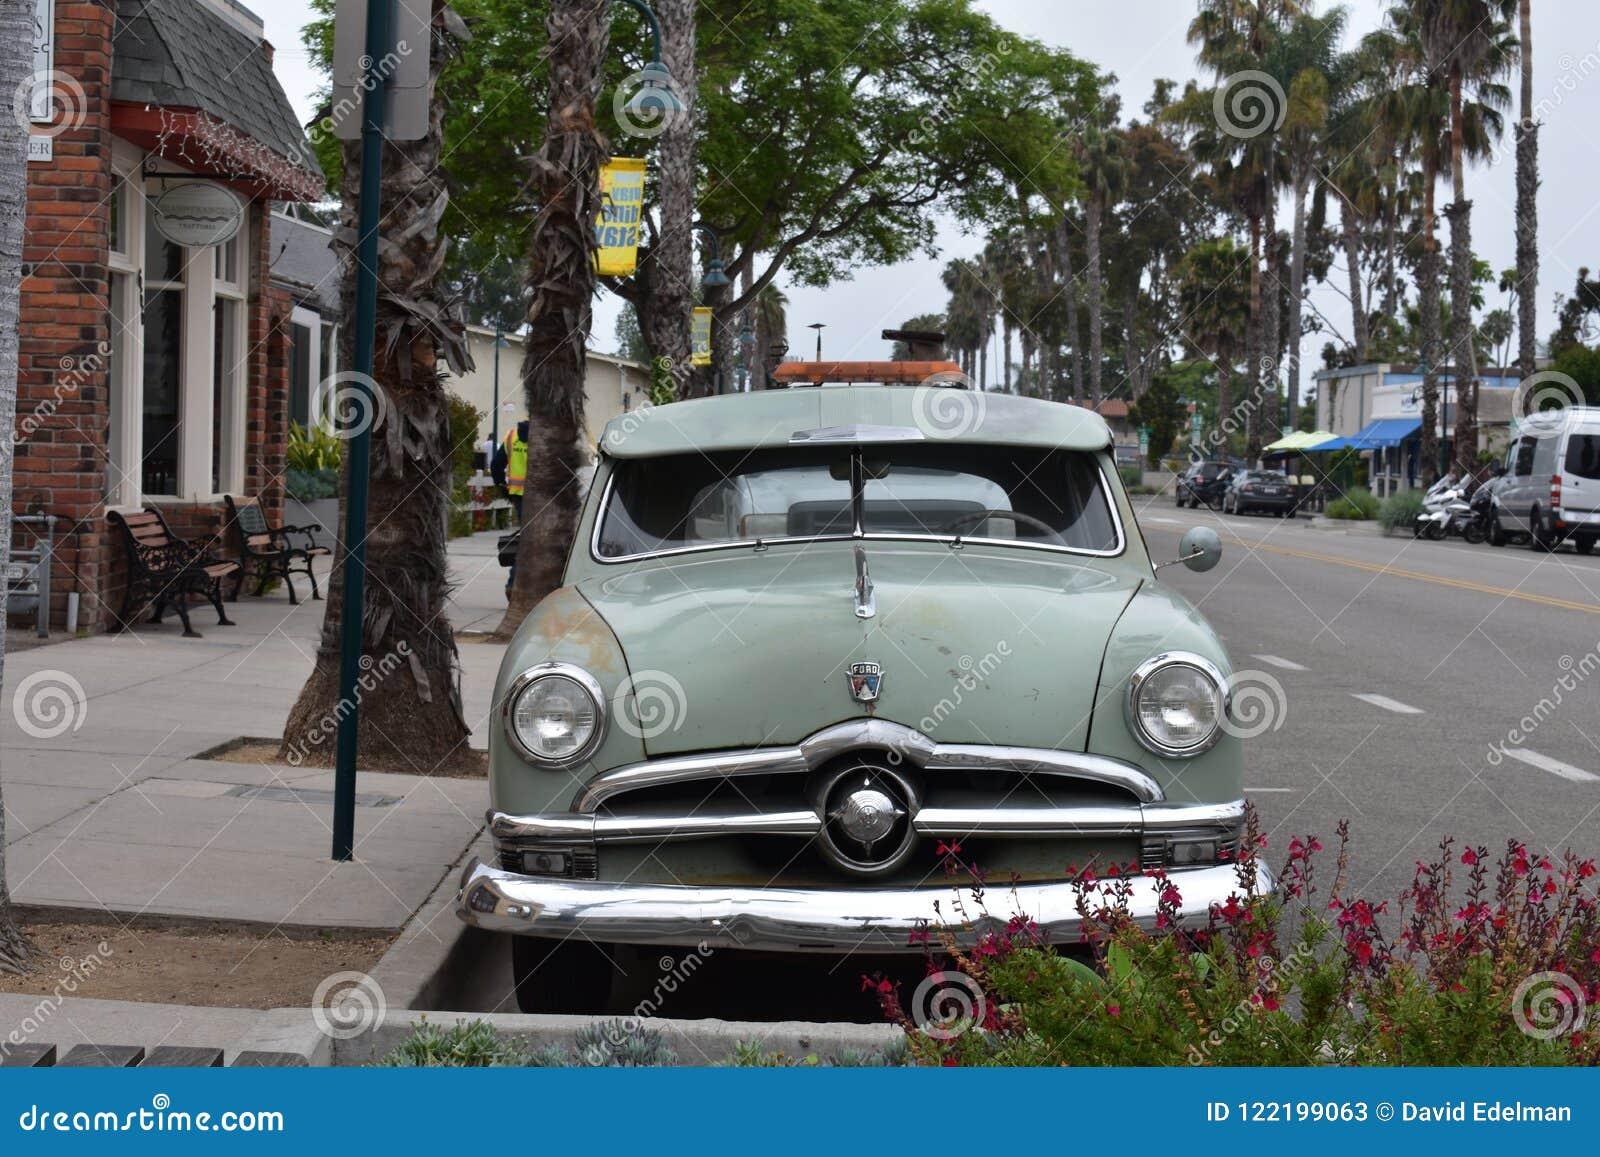 Classico Ford Fordor Sedan 1950 nel verde originale, 1